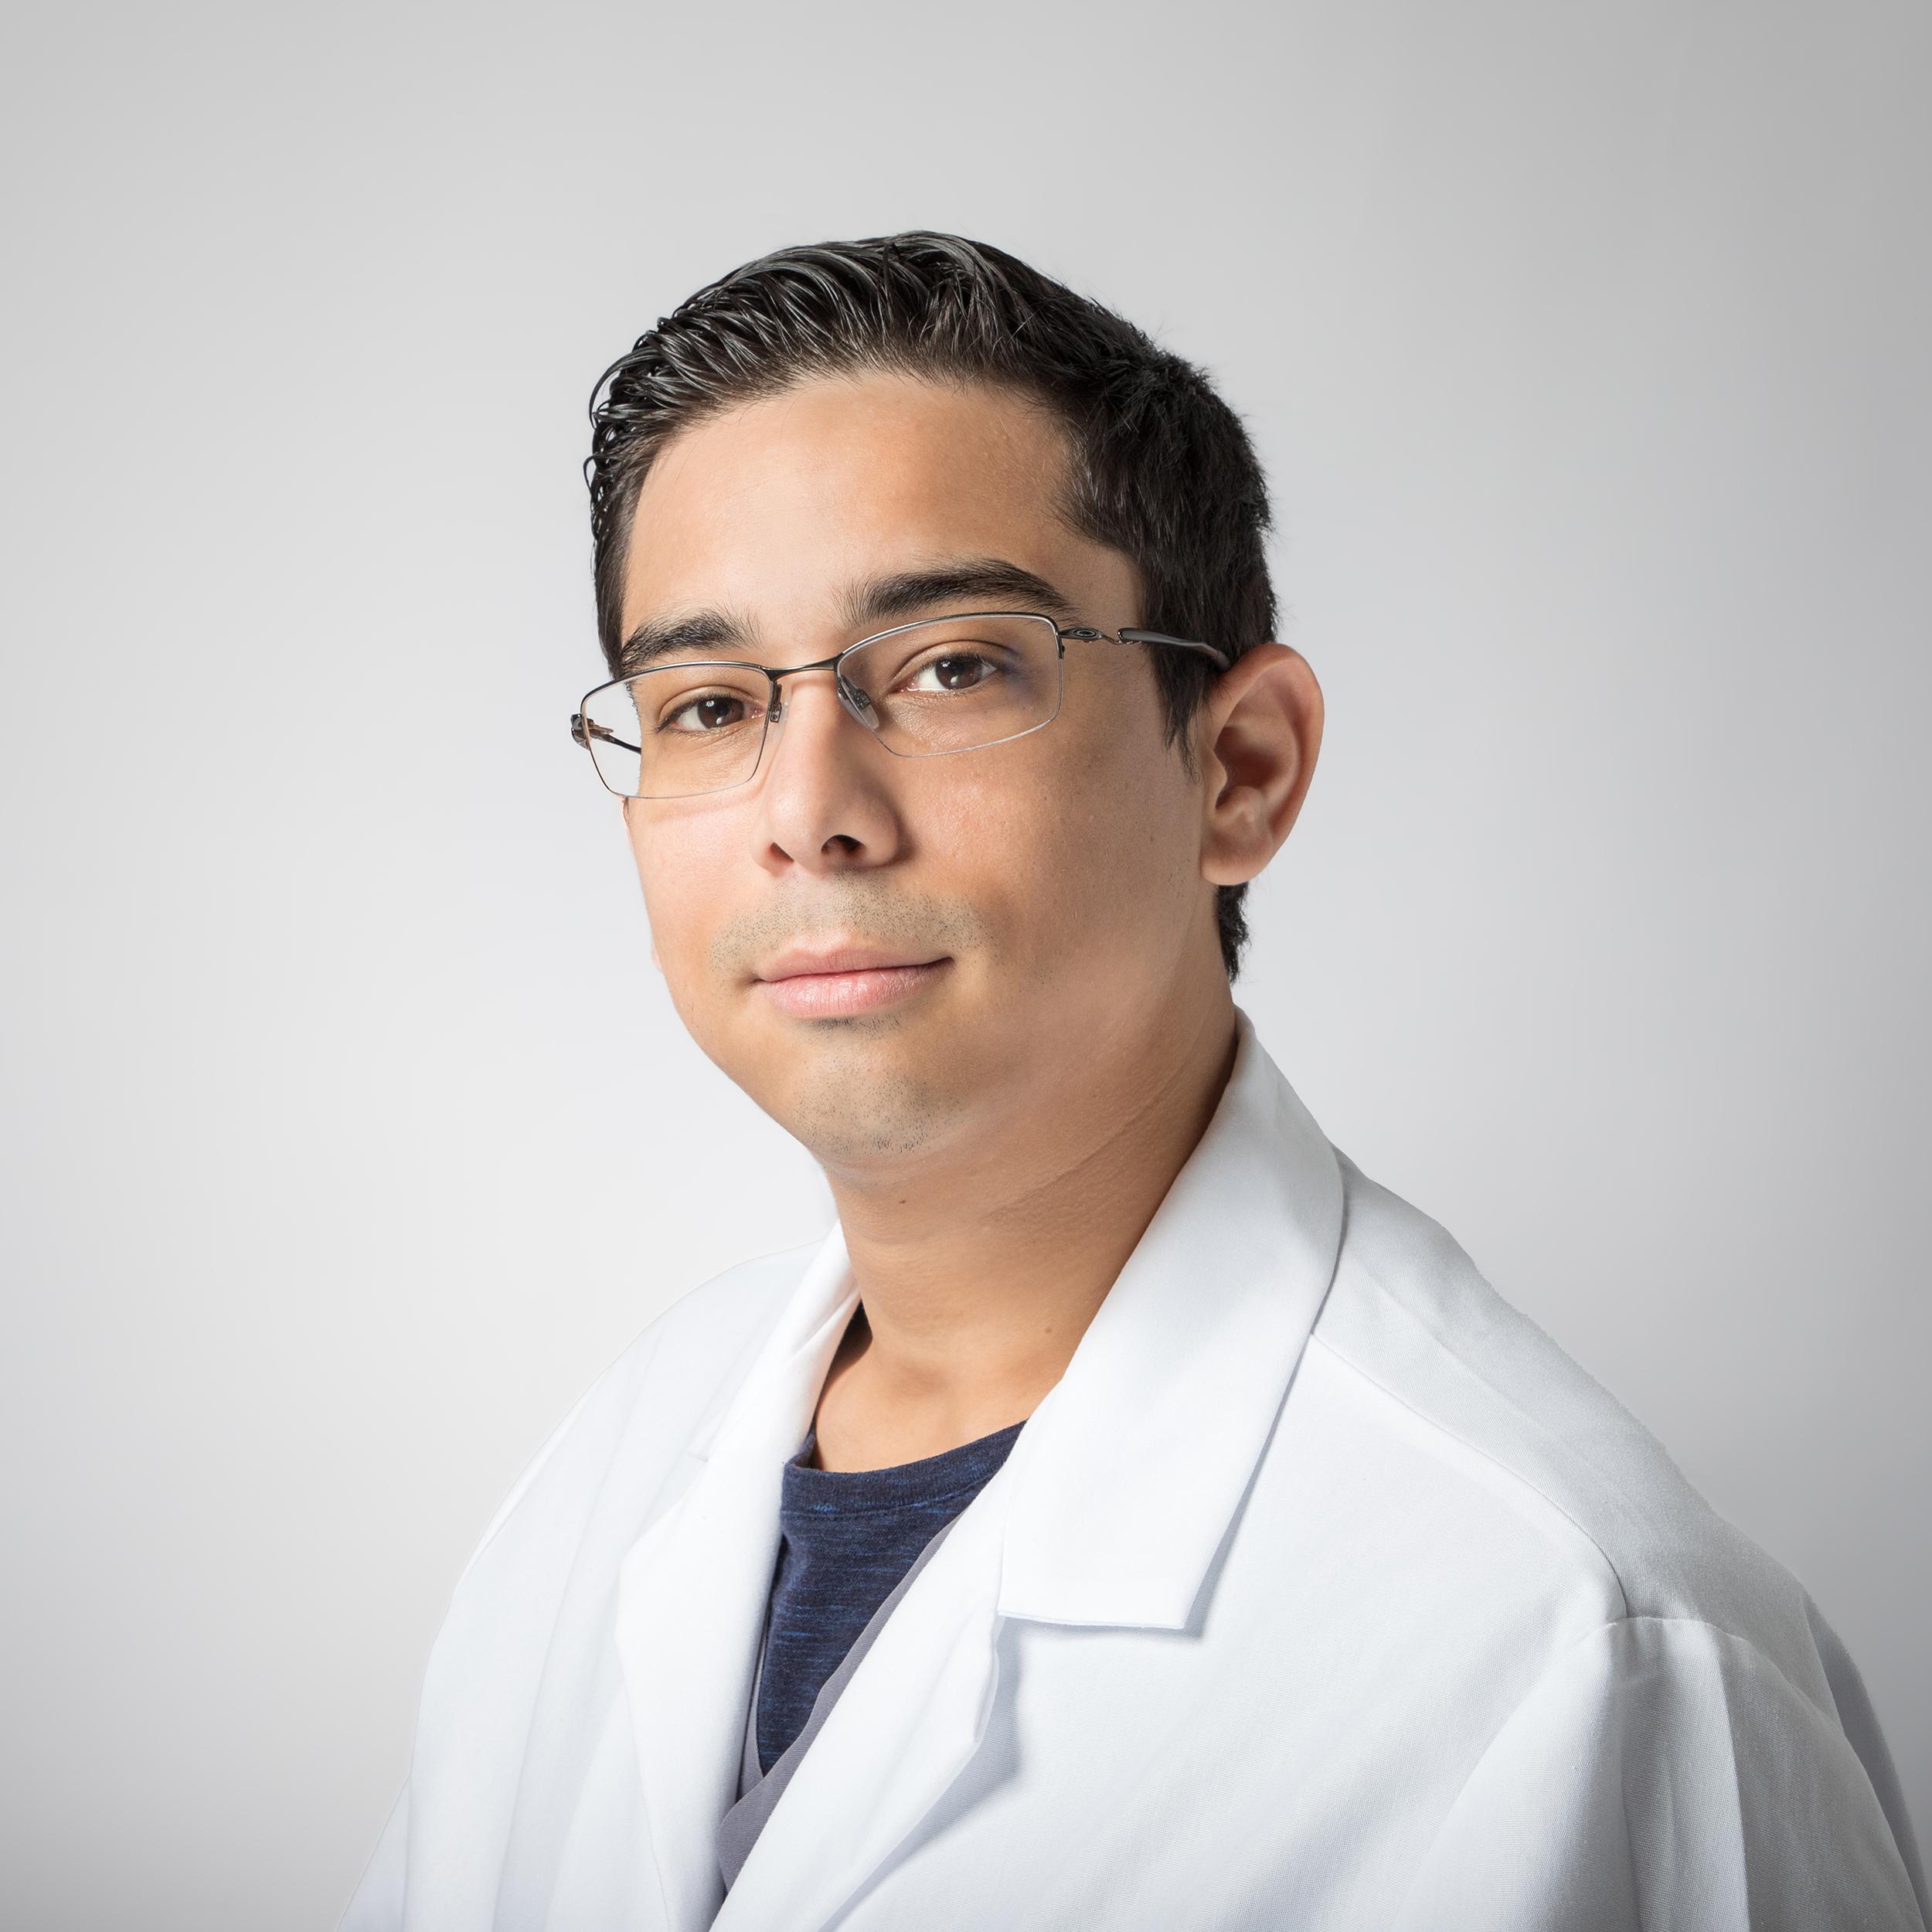 Microbiology Supervisor Christian Jimenez smiles while wearing a white Eagle lab coat.